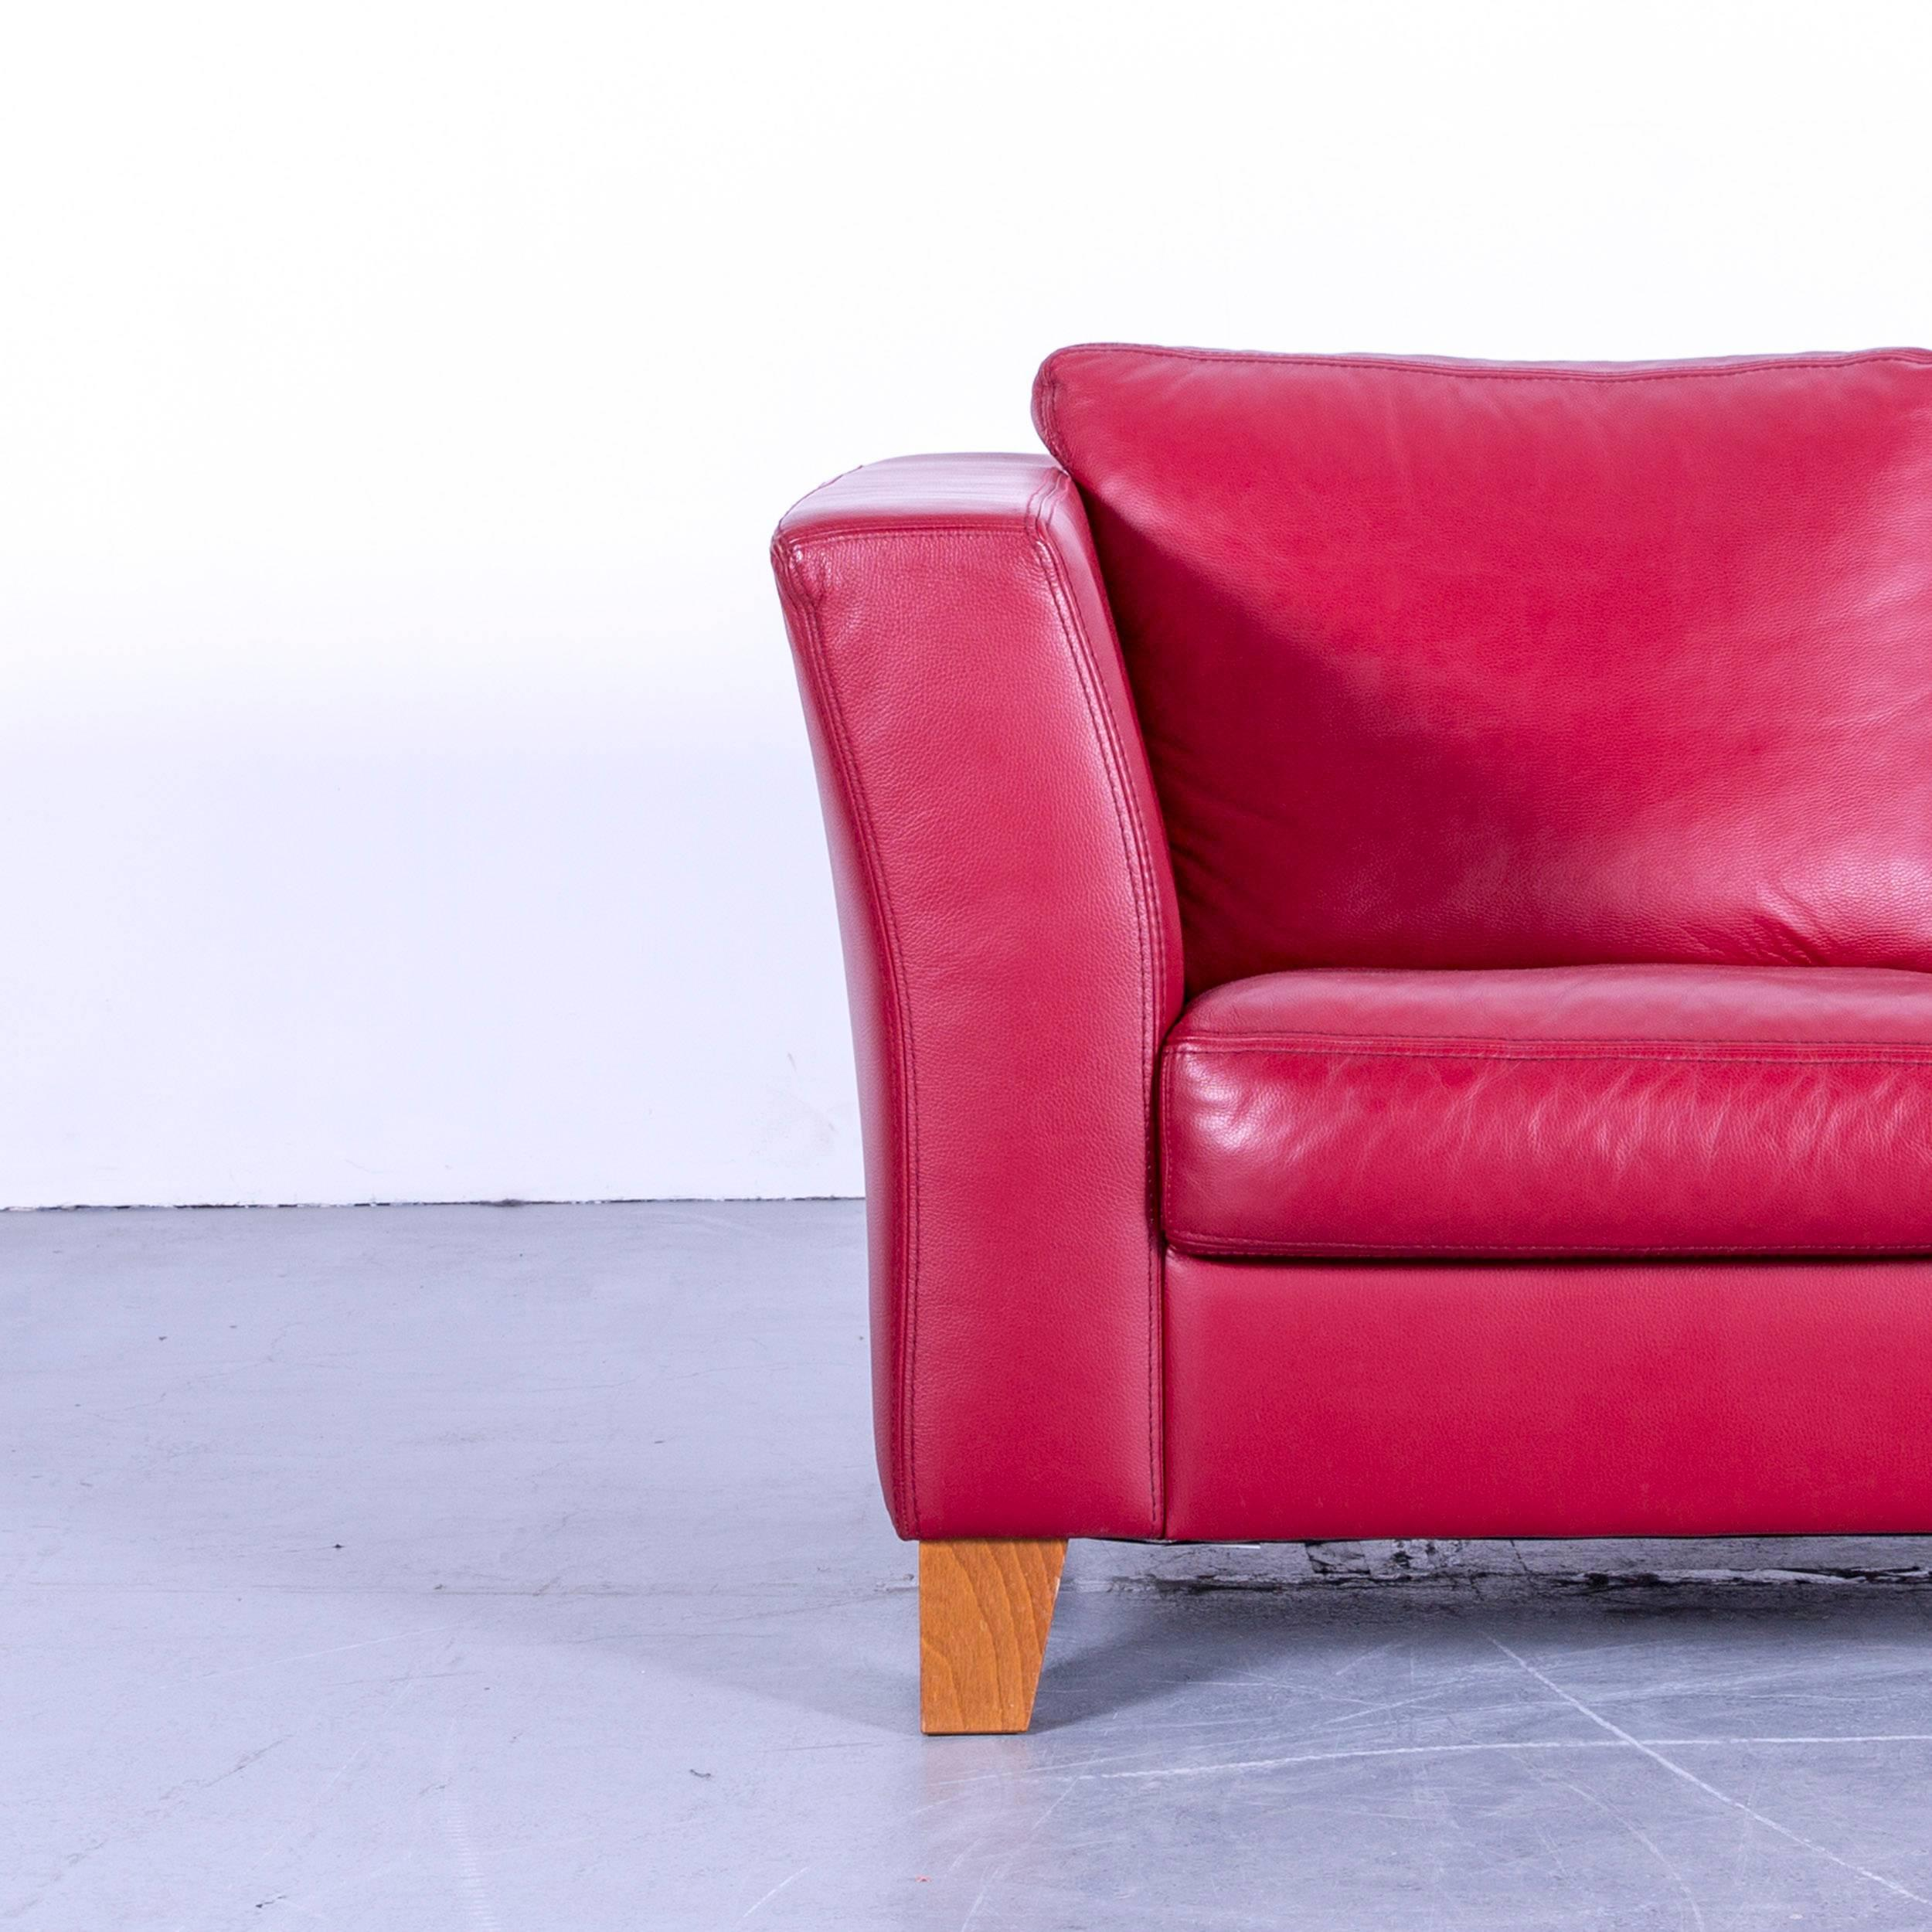 Top Ergebnis 50 Elegant 2 Sitzer sofa Vintage Foto 2018 Pkt6 2017